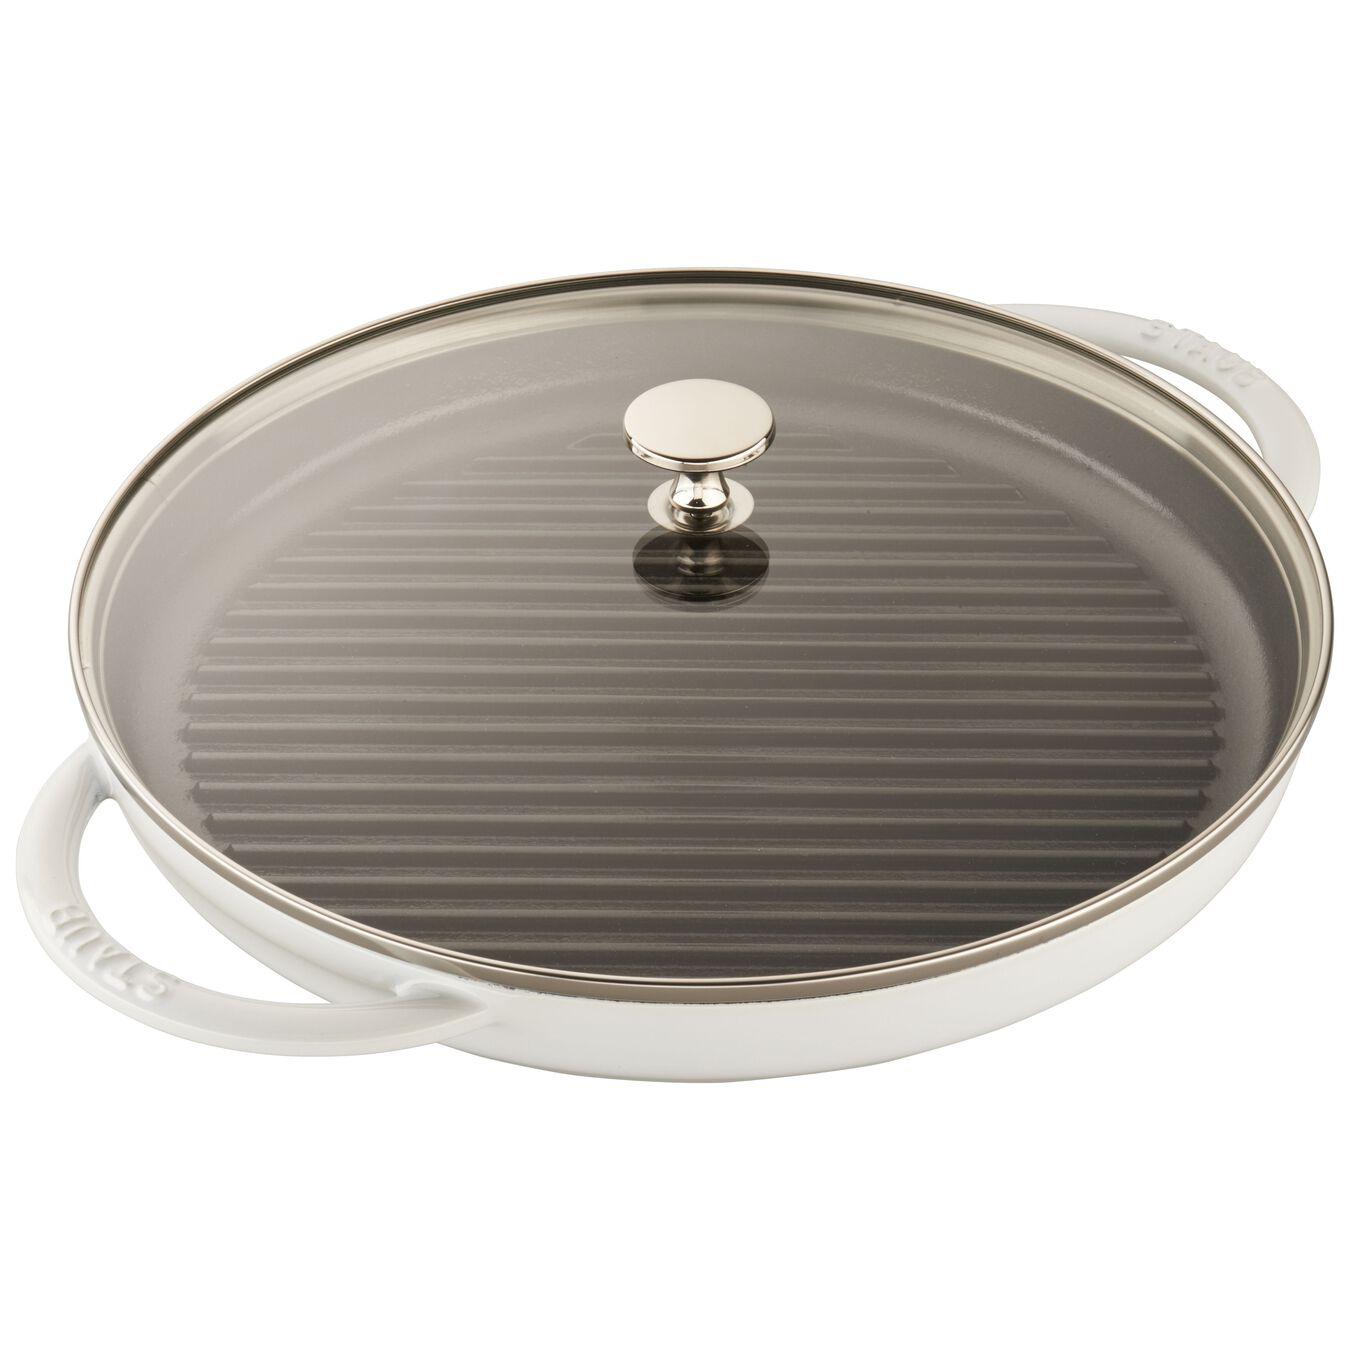 12-inch Round Steam Grill - White,,large 1